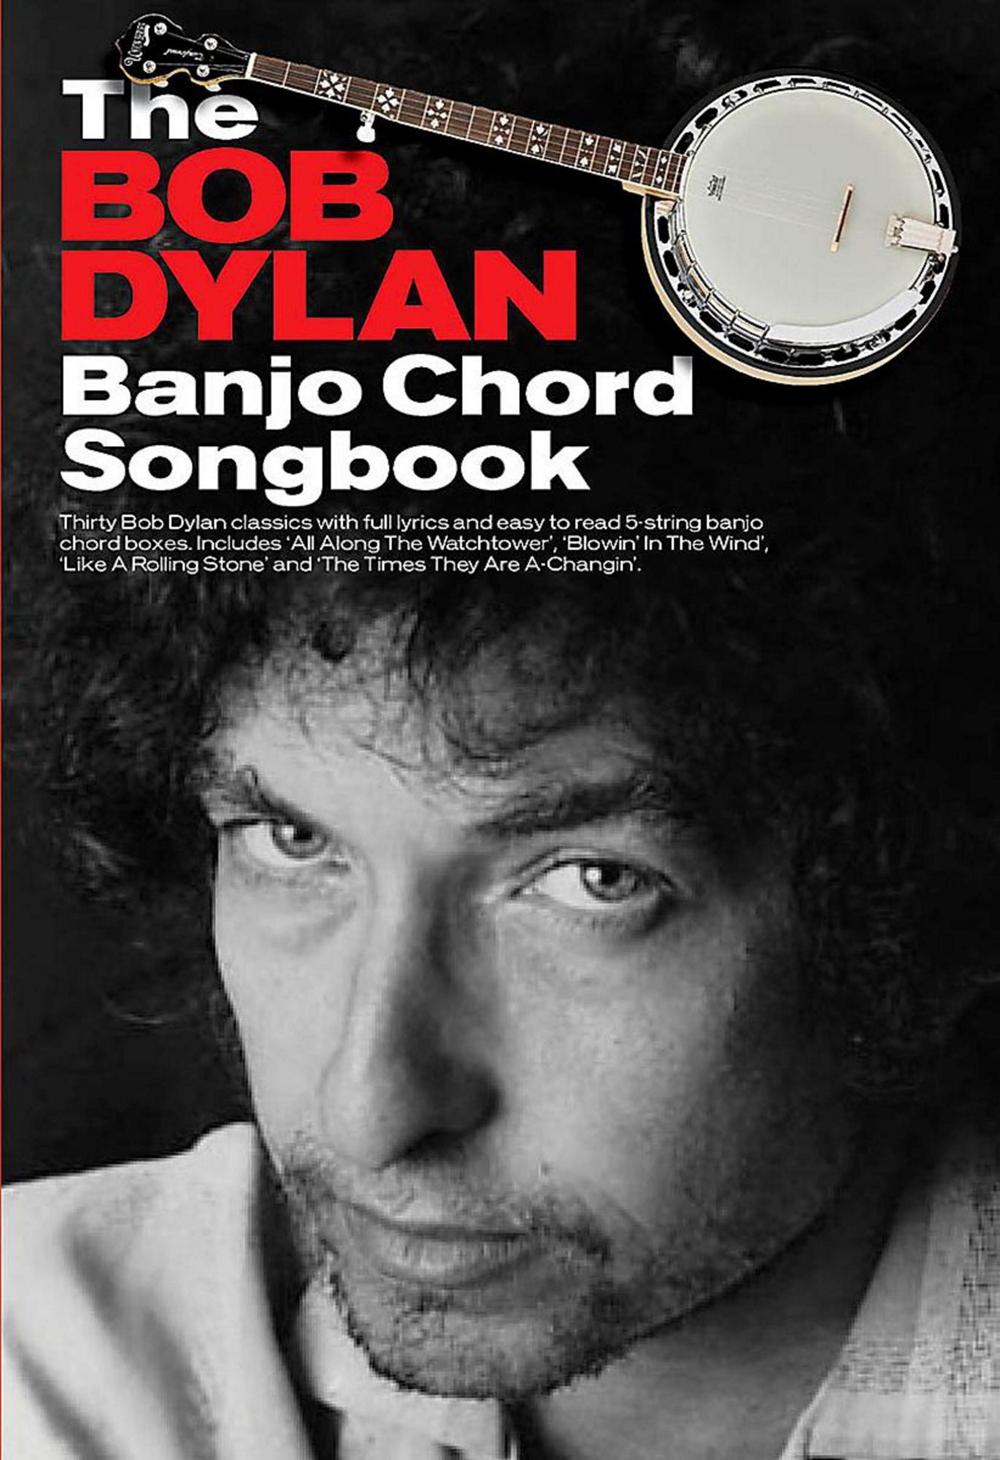 The bob dylan banjo chord songbook 1783054360 ebay the bob dylan banjo chord songbook hexwebz Images